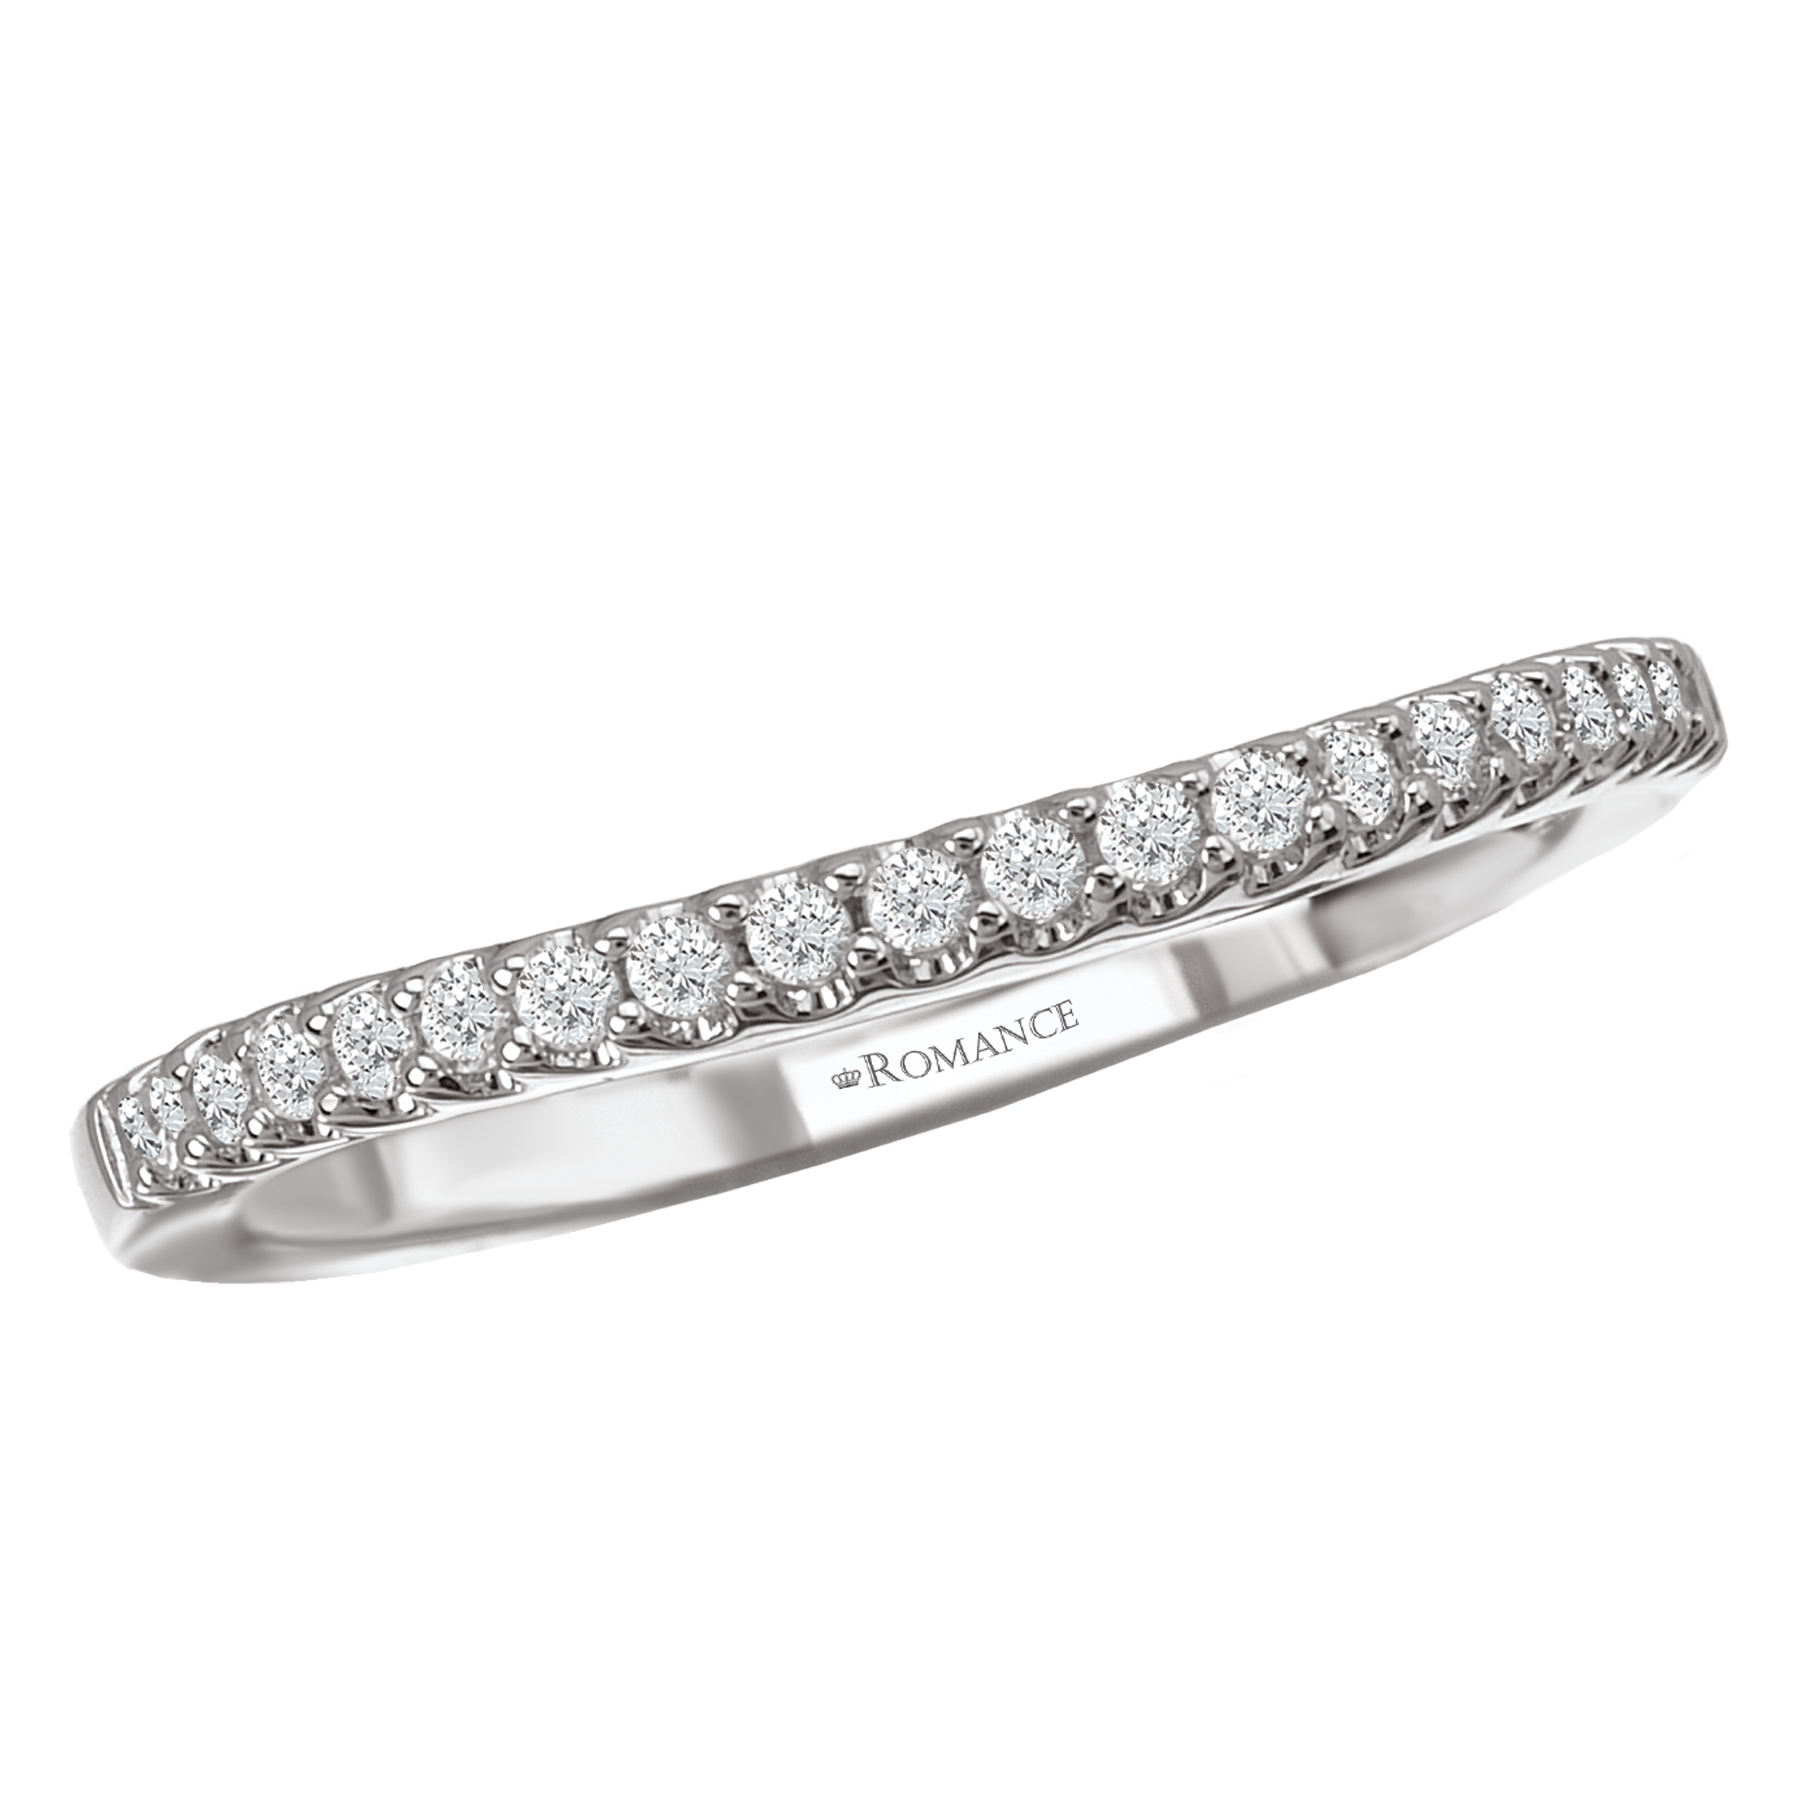 Romance Wedding Bands 117497-W product image